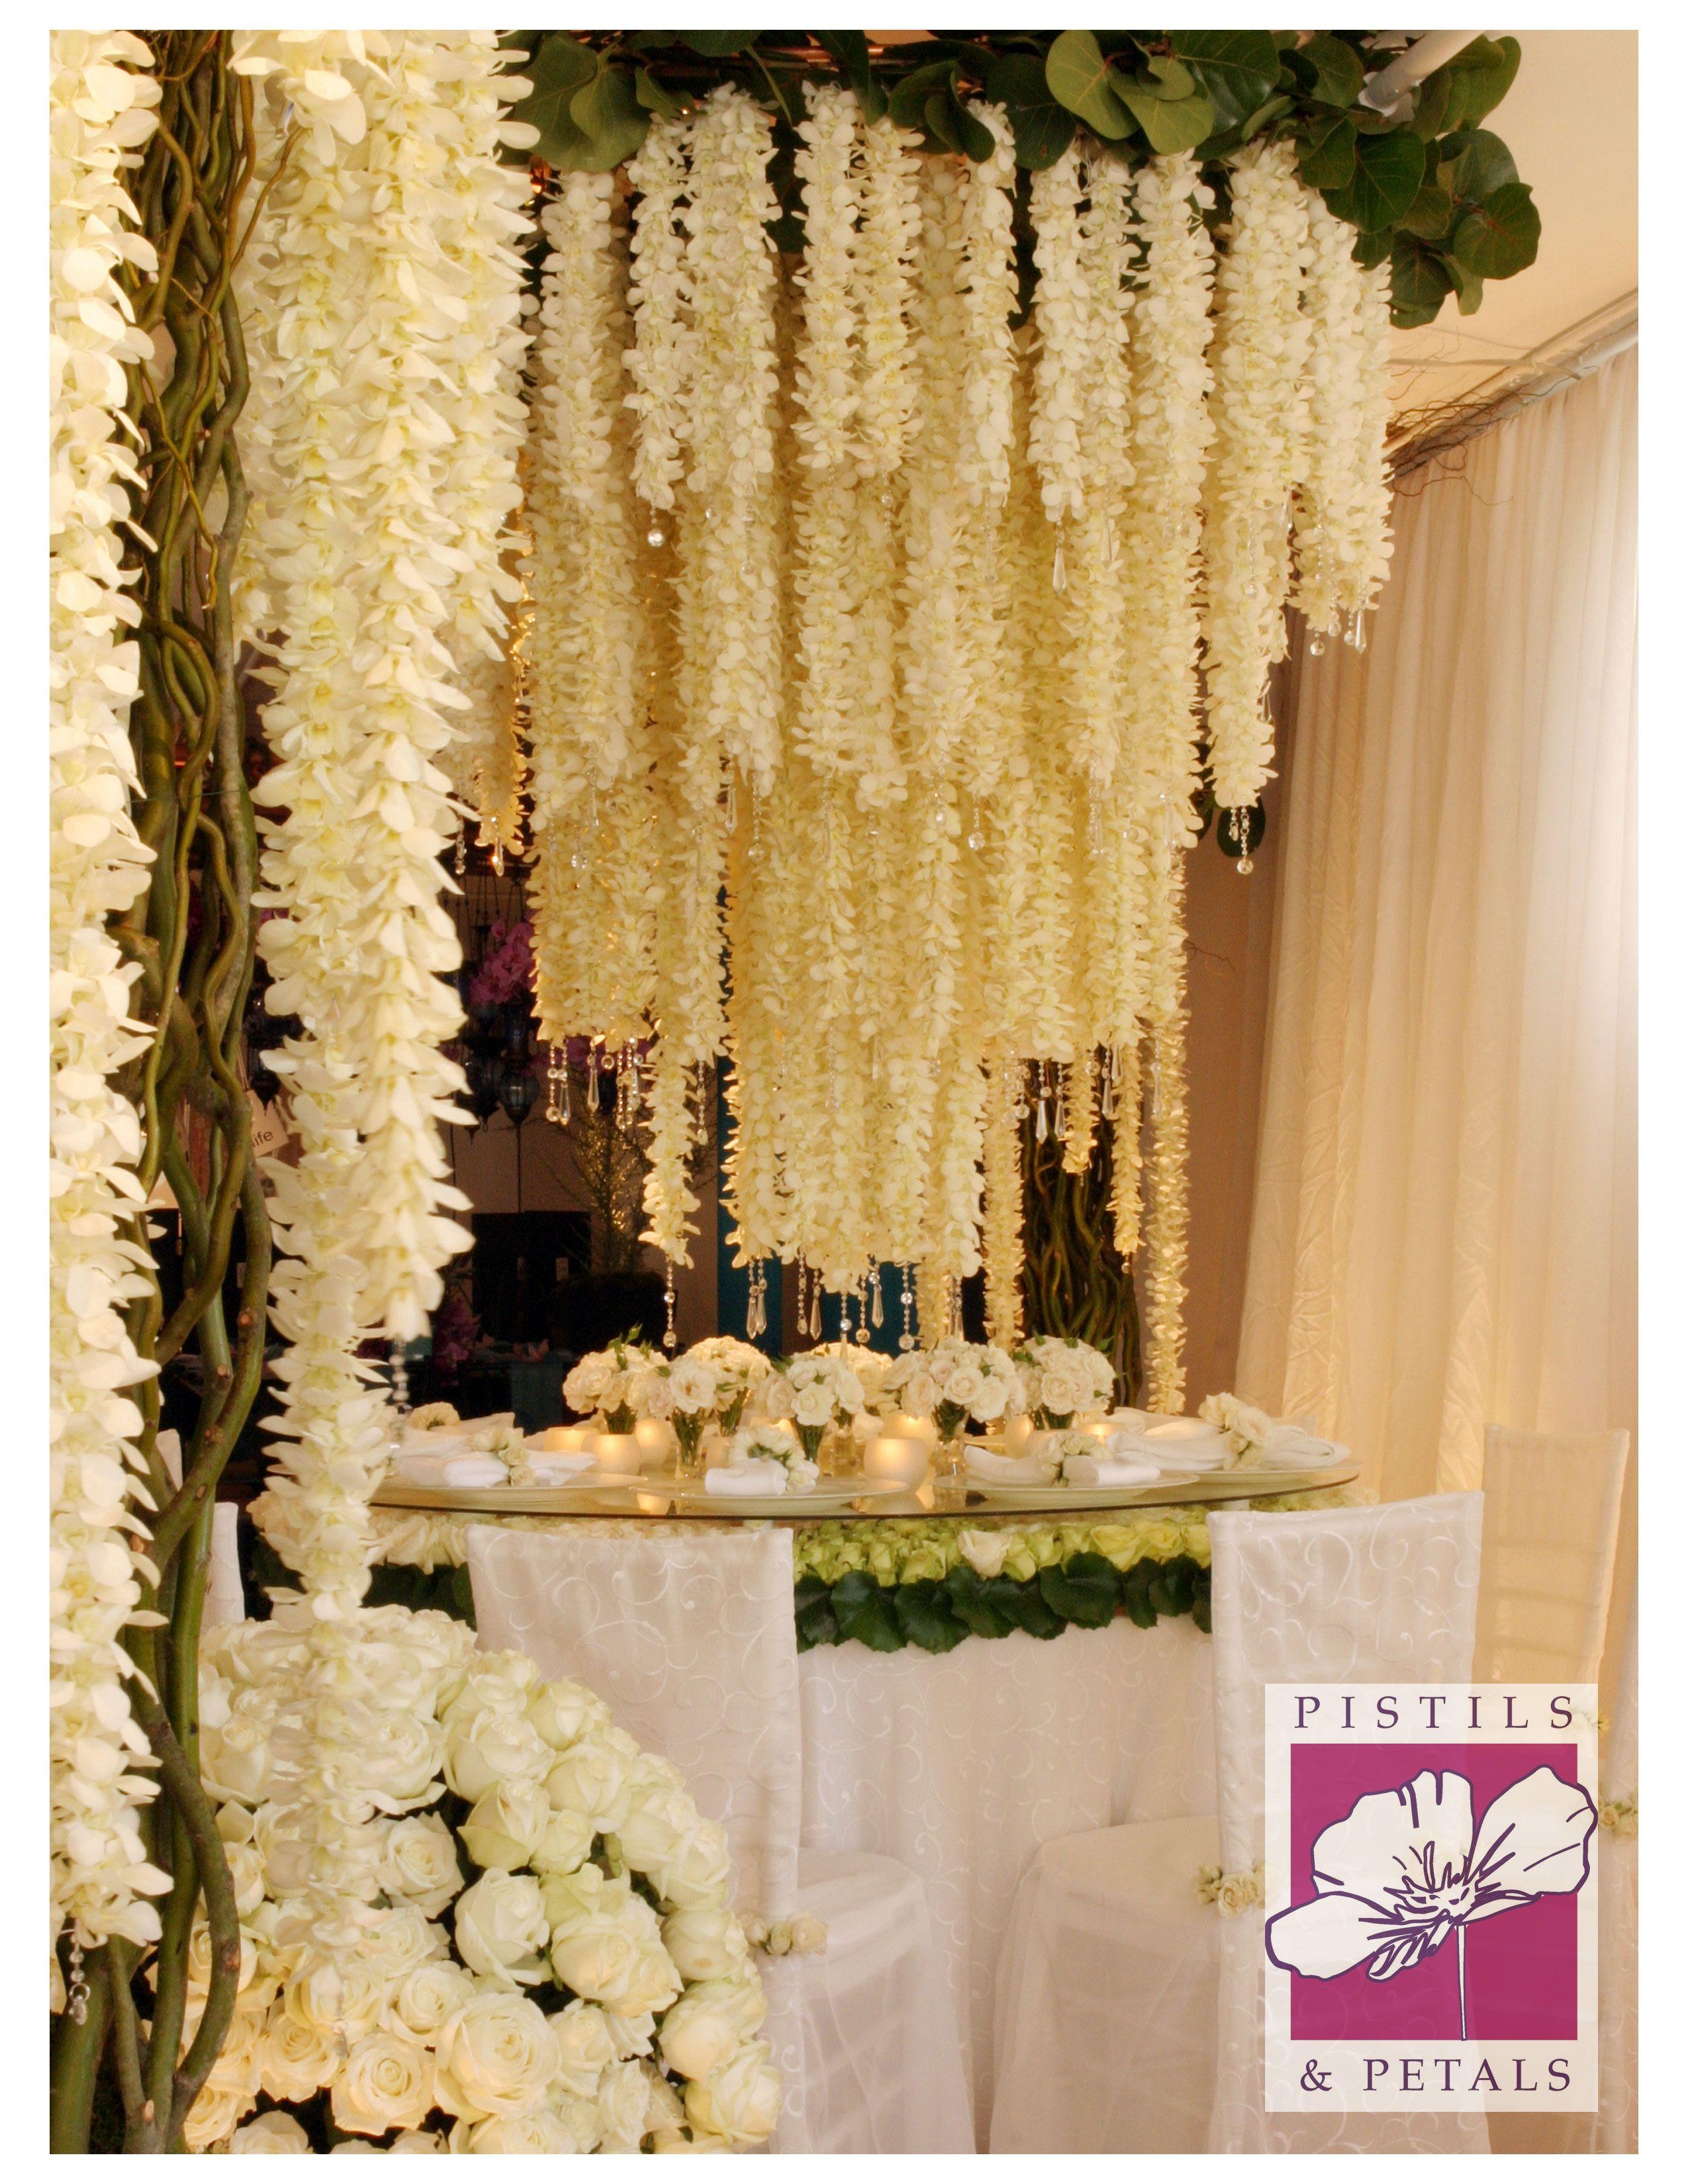 Suspended florals for weddings suspended floral arrangements - Wedding Centerpiece Flower Arrangement By Pistils Petals Hanging Flower